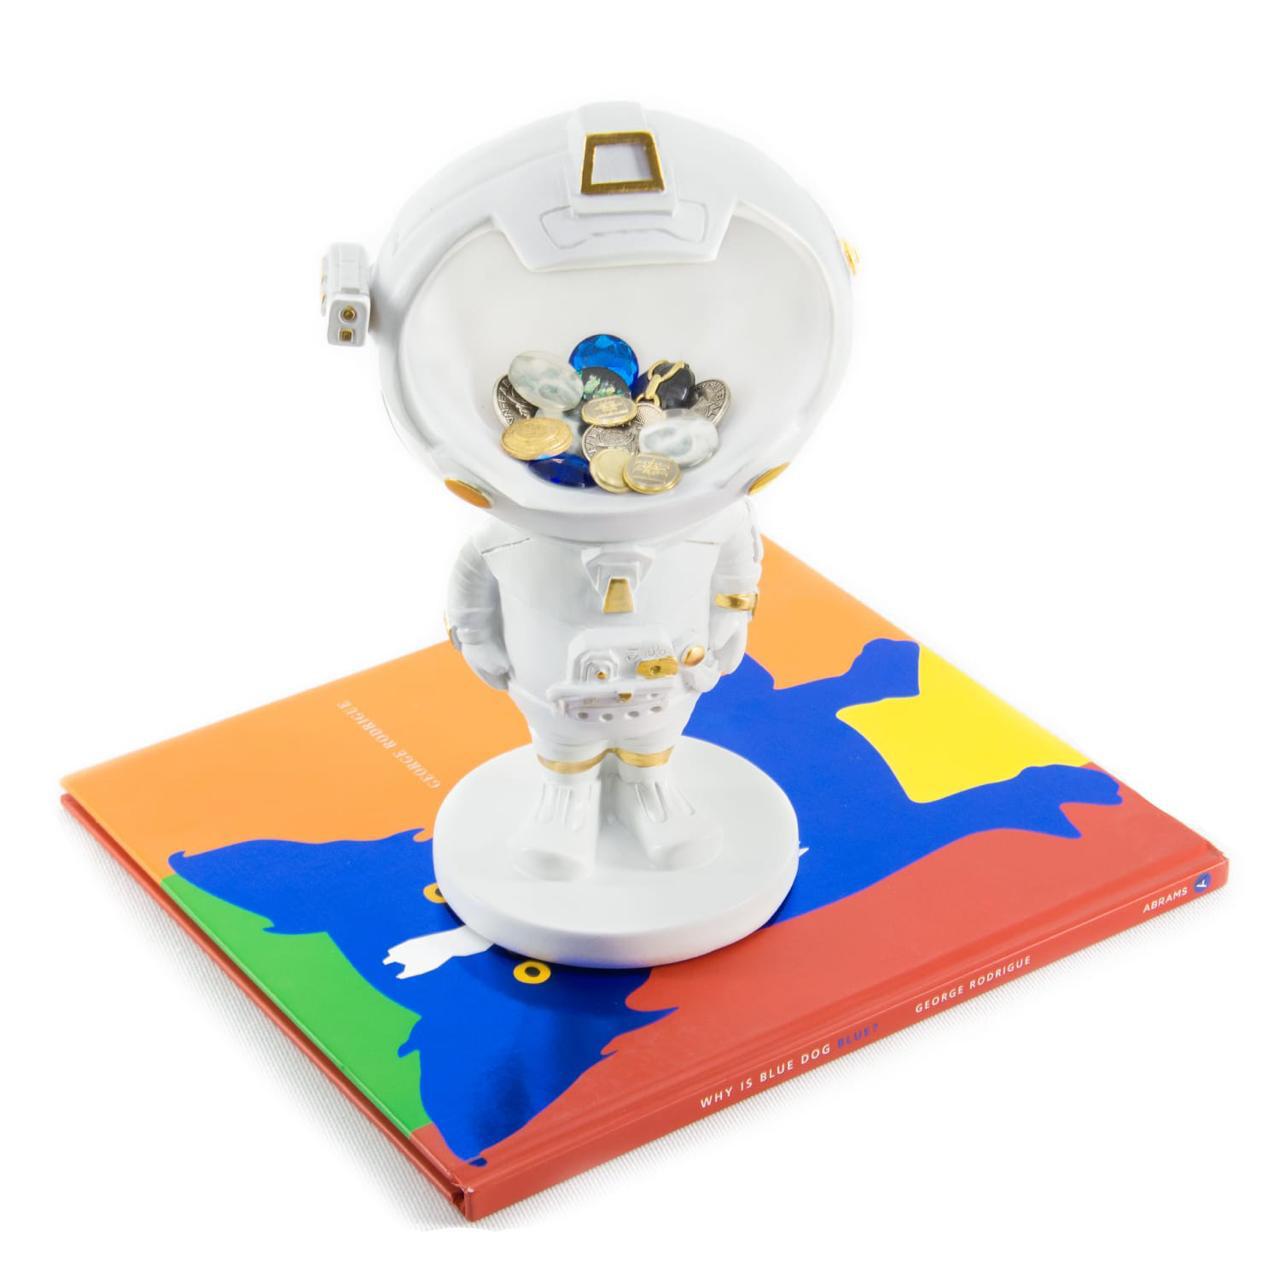 Astronaut Candy Bowl Sculpture - Cool Ornaments